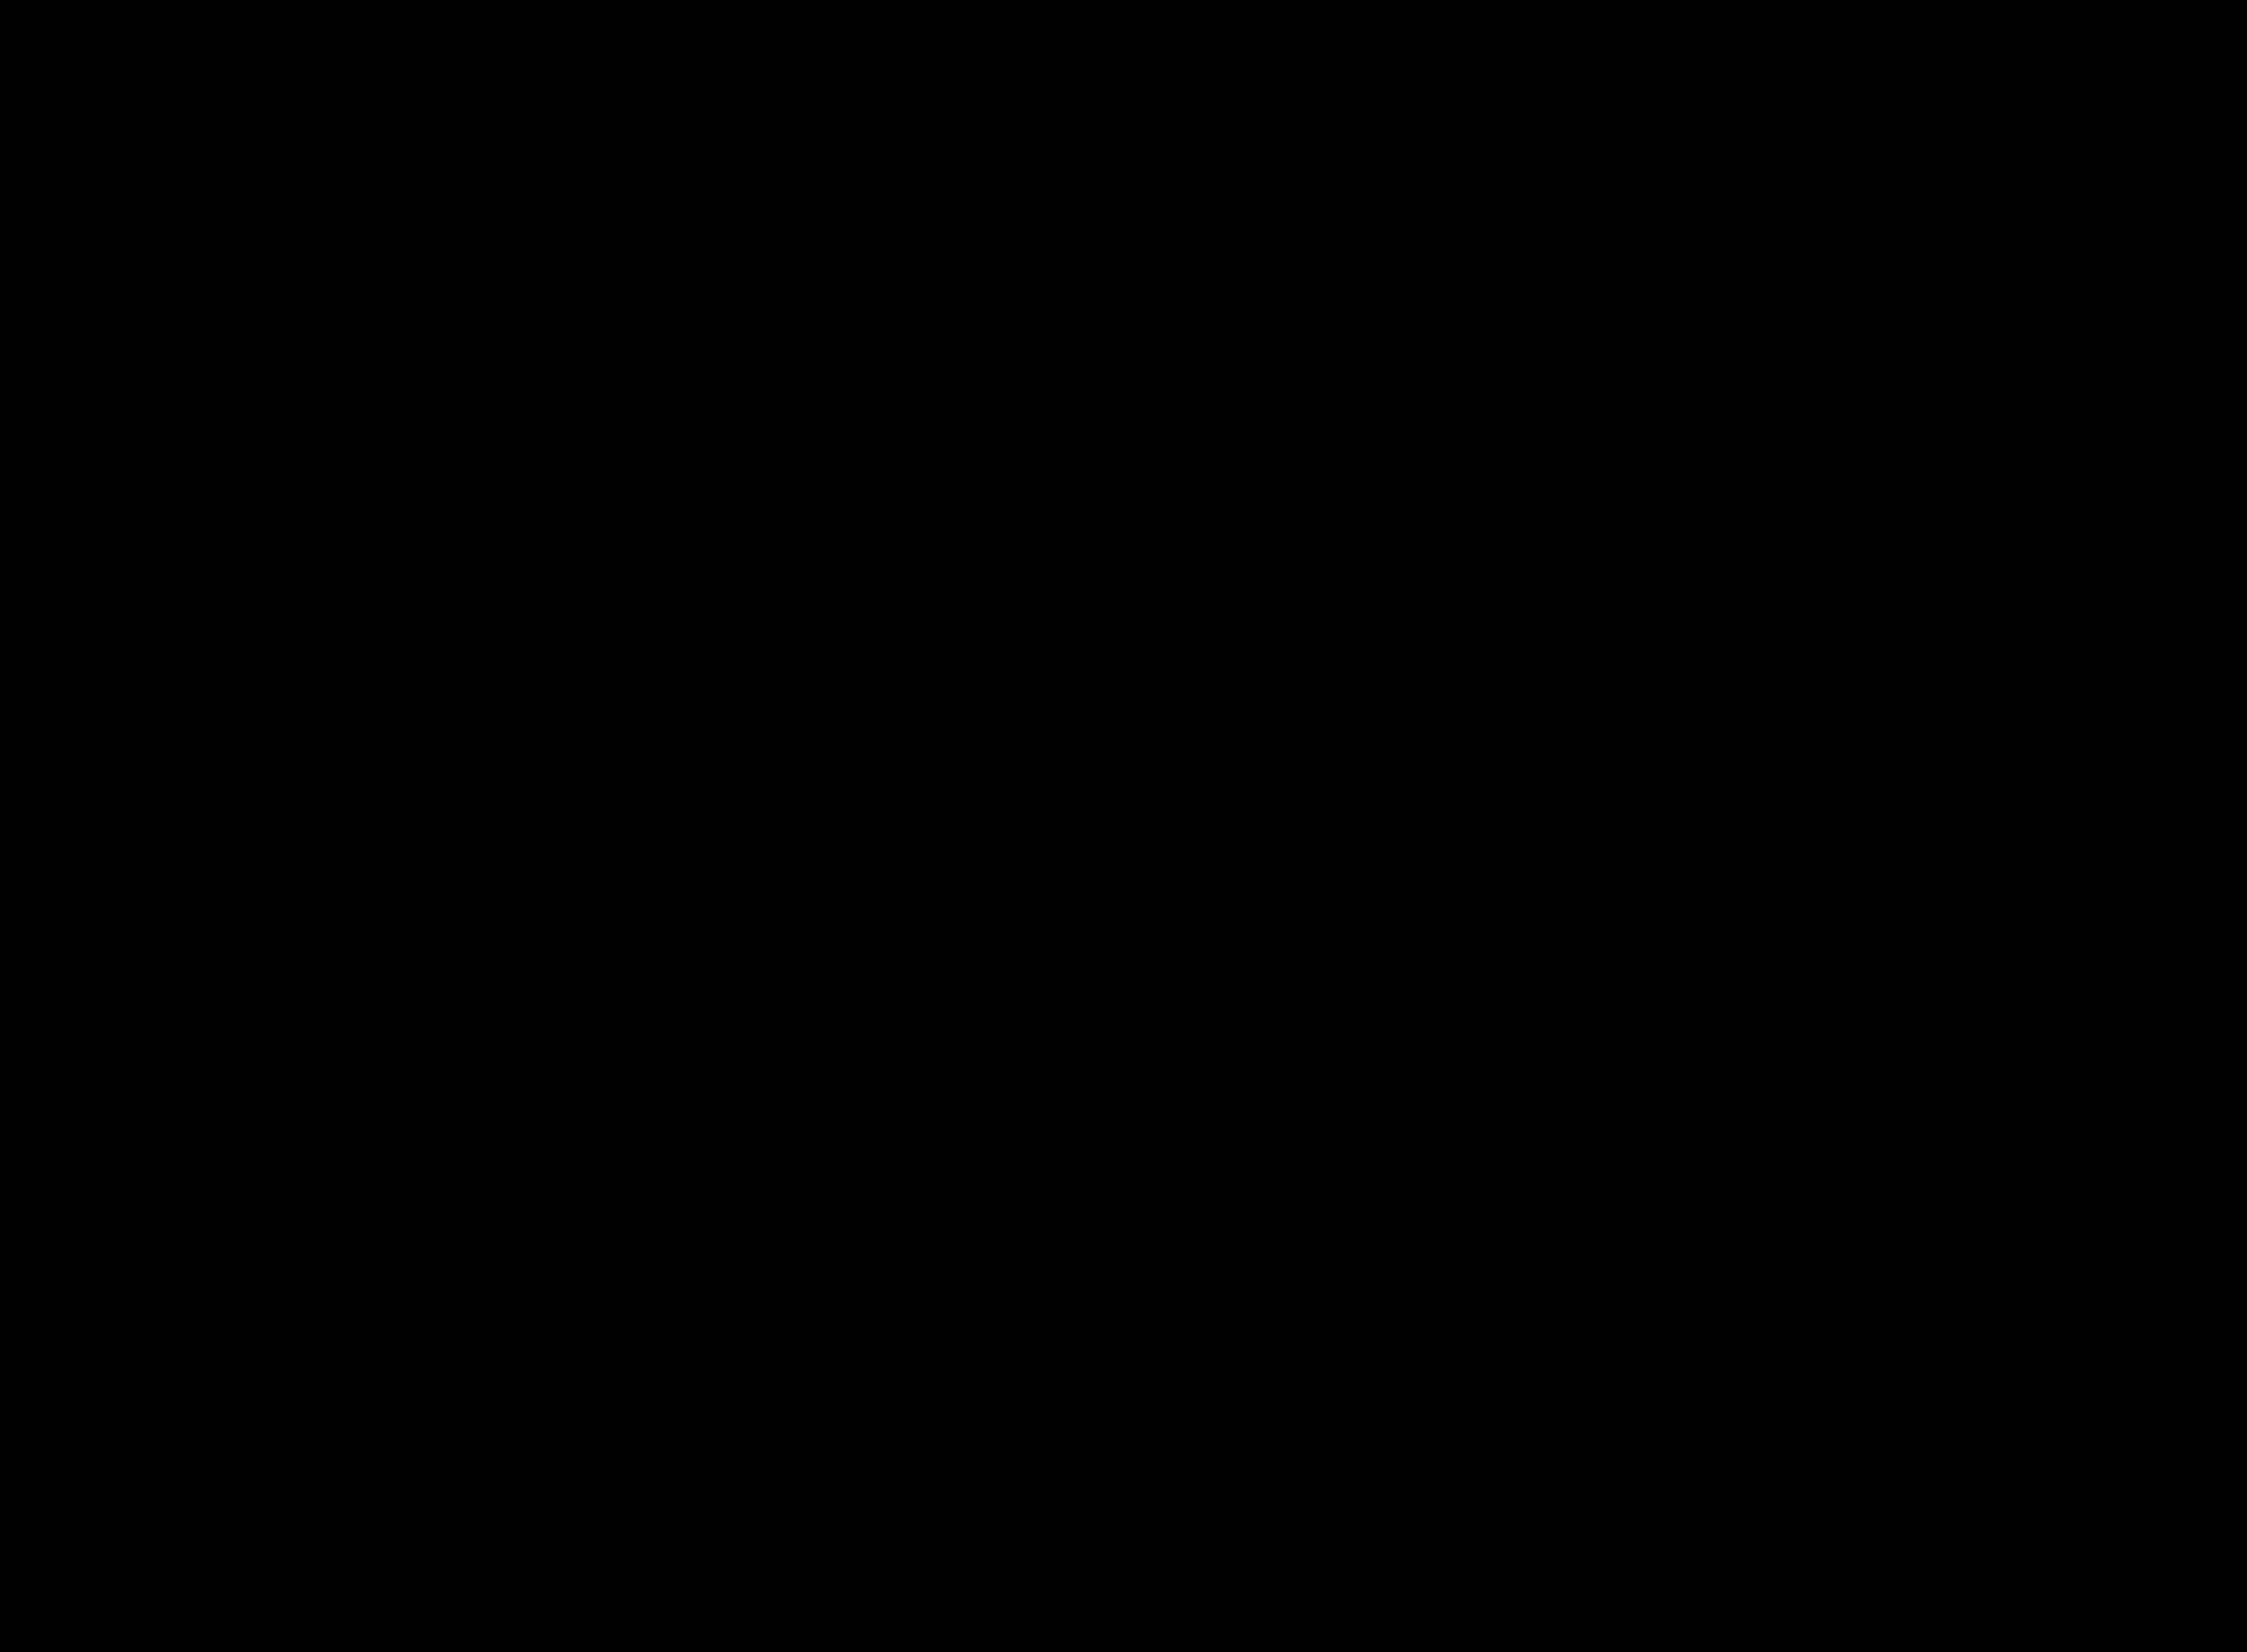 2400x1765 Vector R